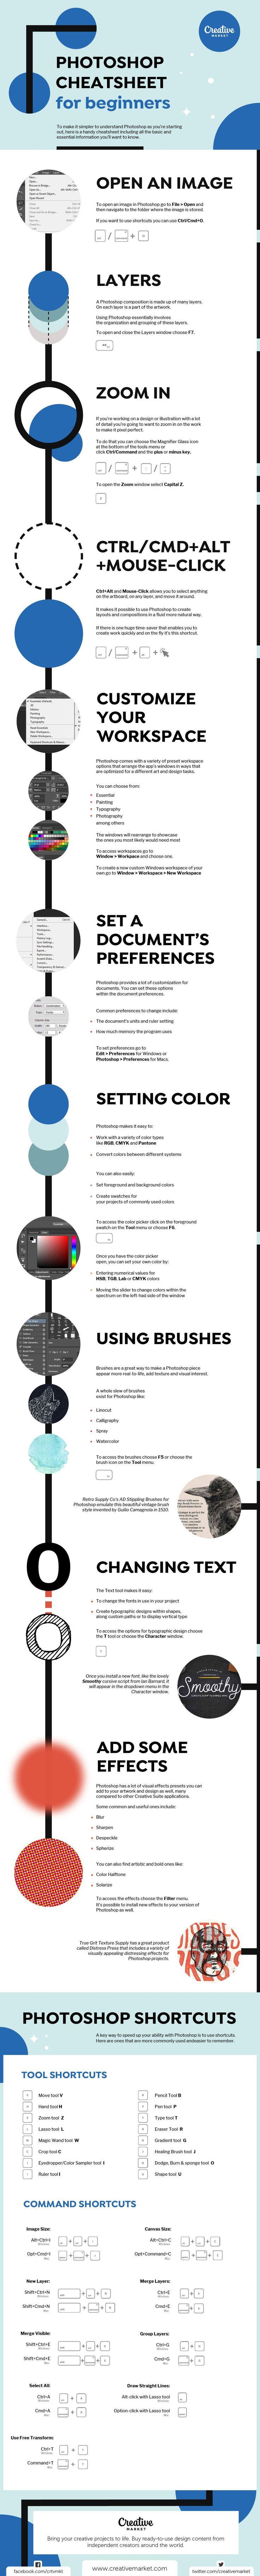 #Photoshop #Cheatsheet for beginners [#infographic]